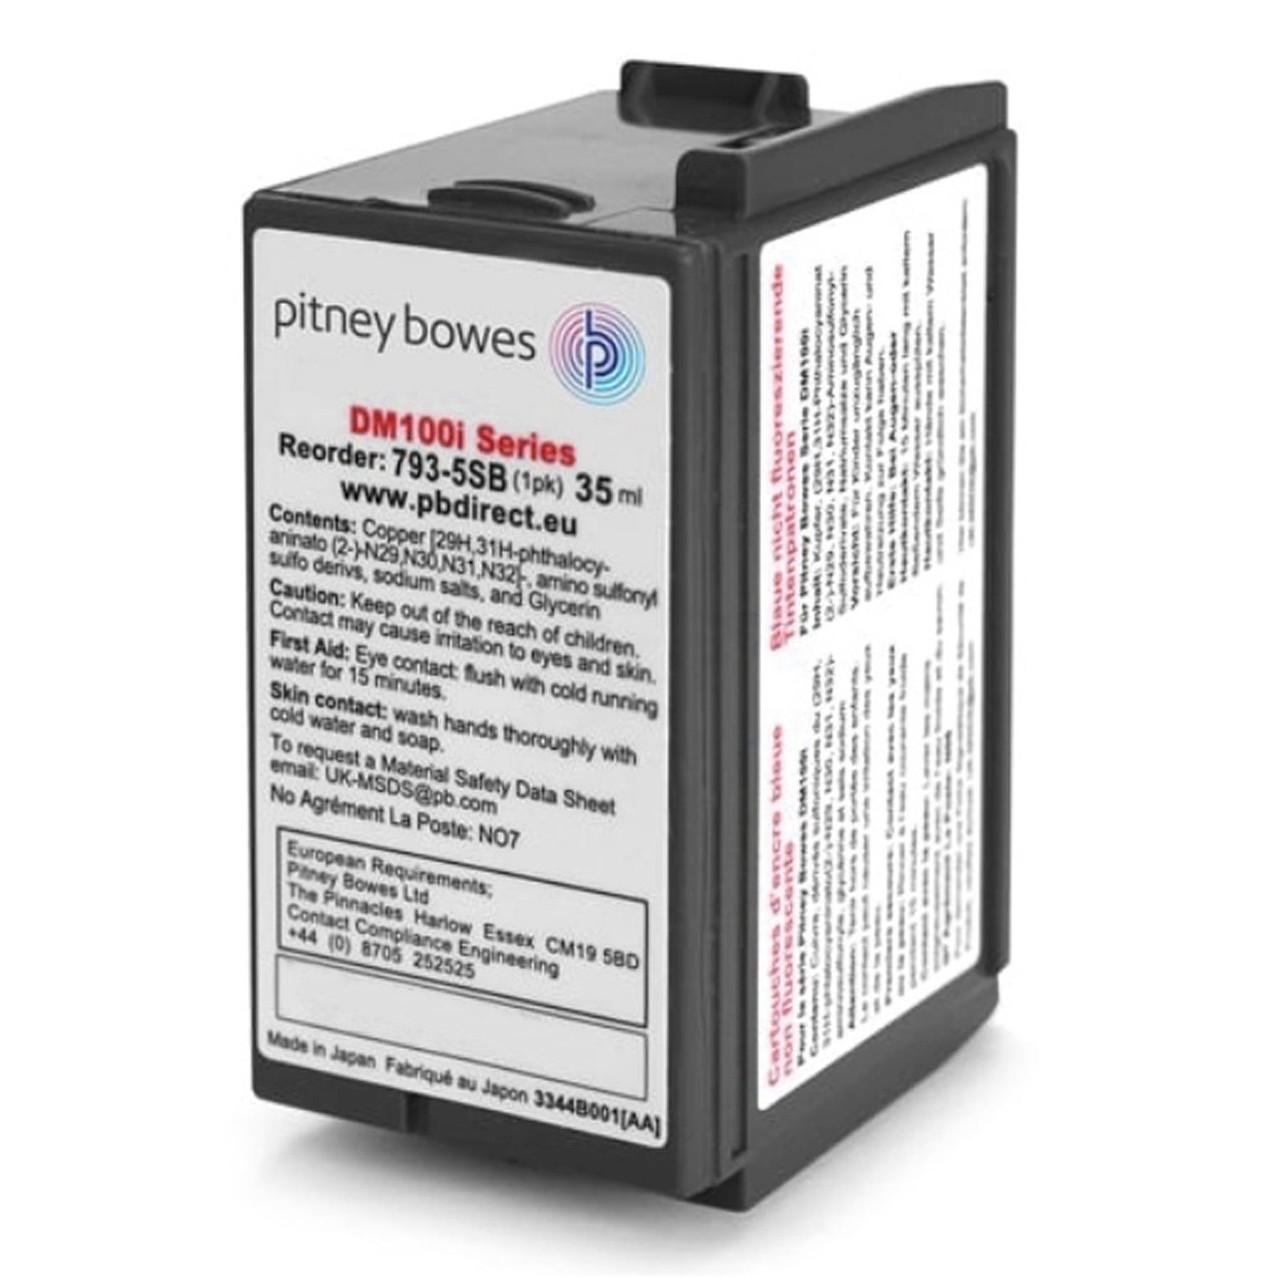 Original Pitney Bowes DM100i - DM200i Franking Ink Cartridge